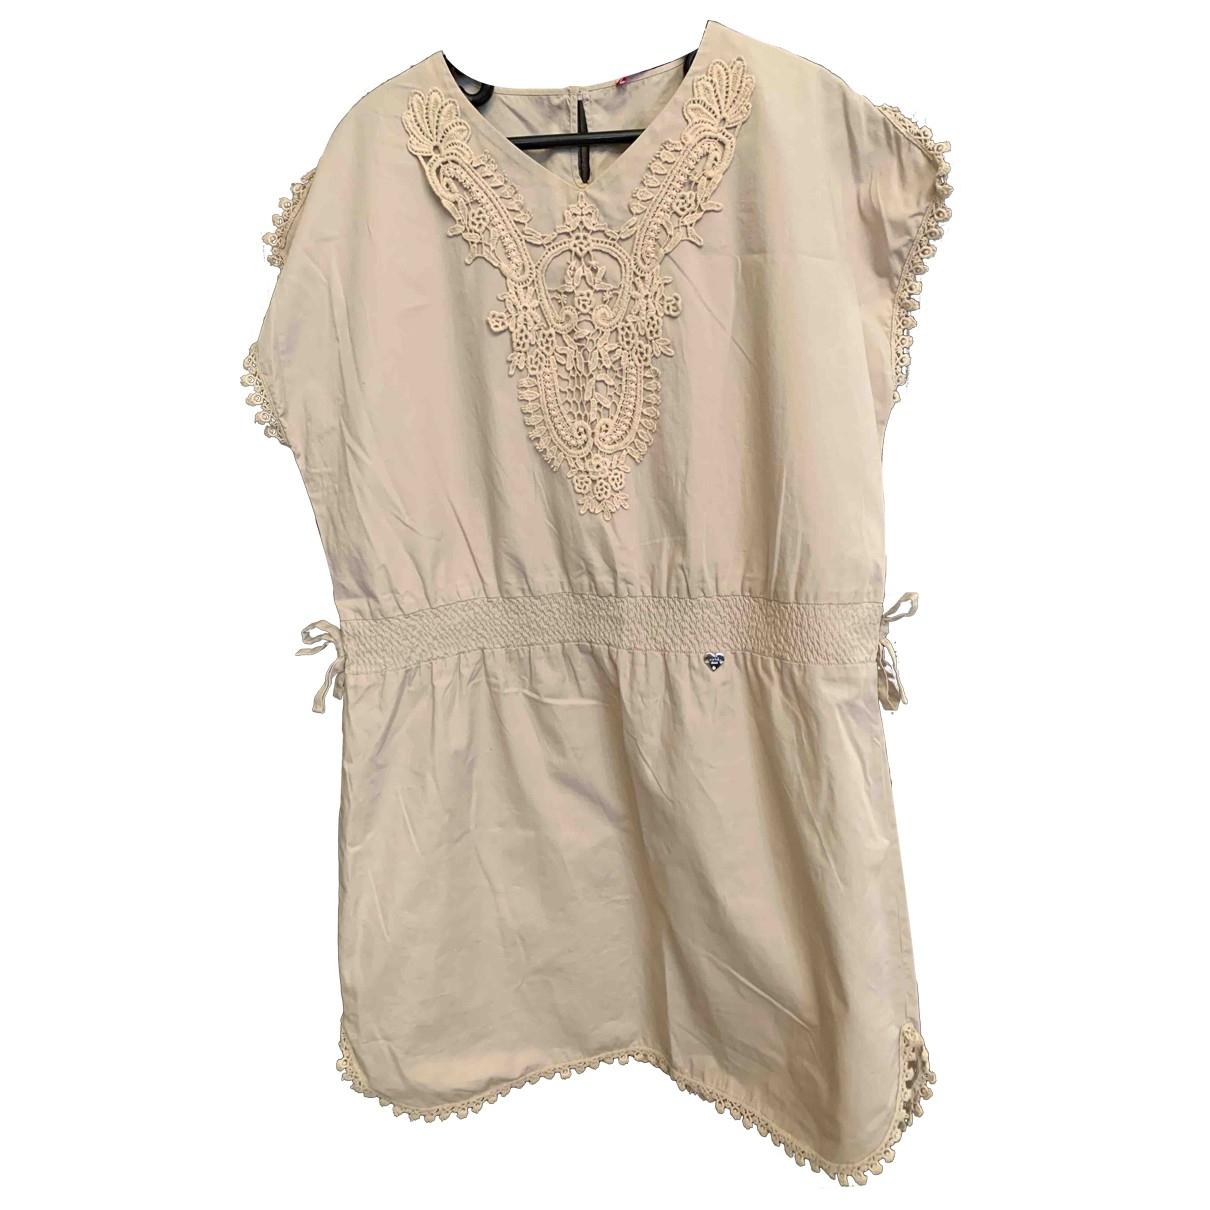 Liu.jo \N Kleid in  Beige Baumwolle